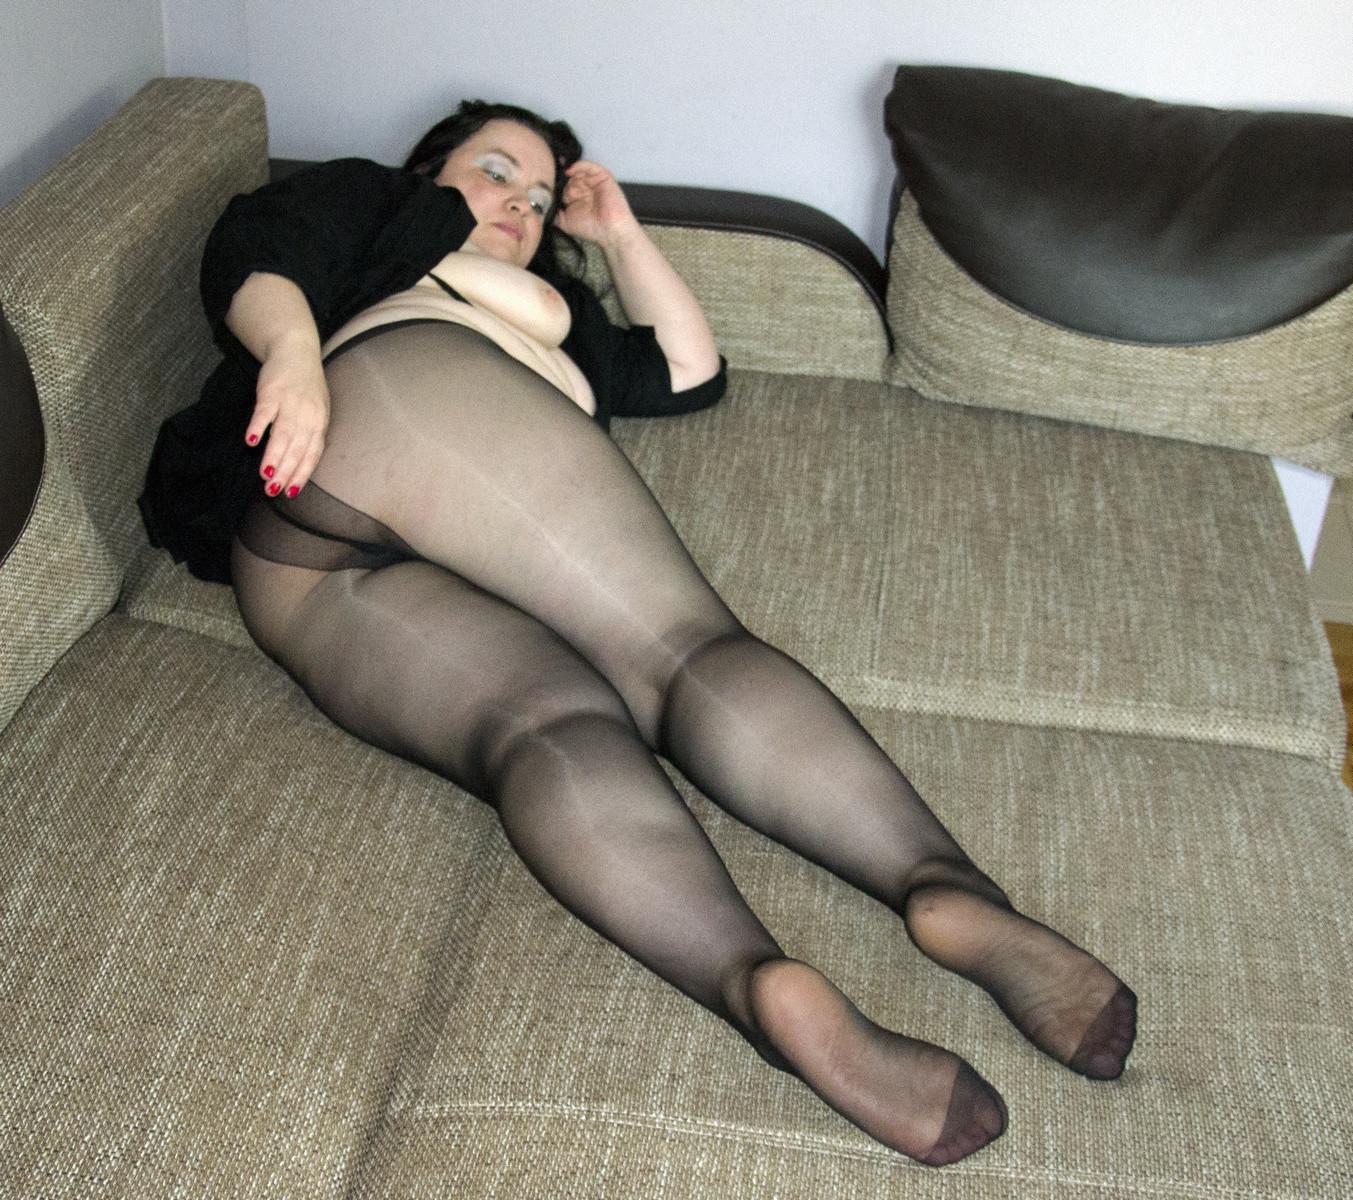 Pantyhose ladies, mature porn photos, sexy older women